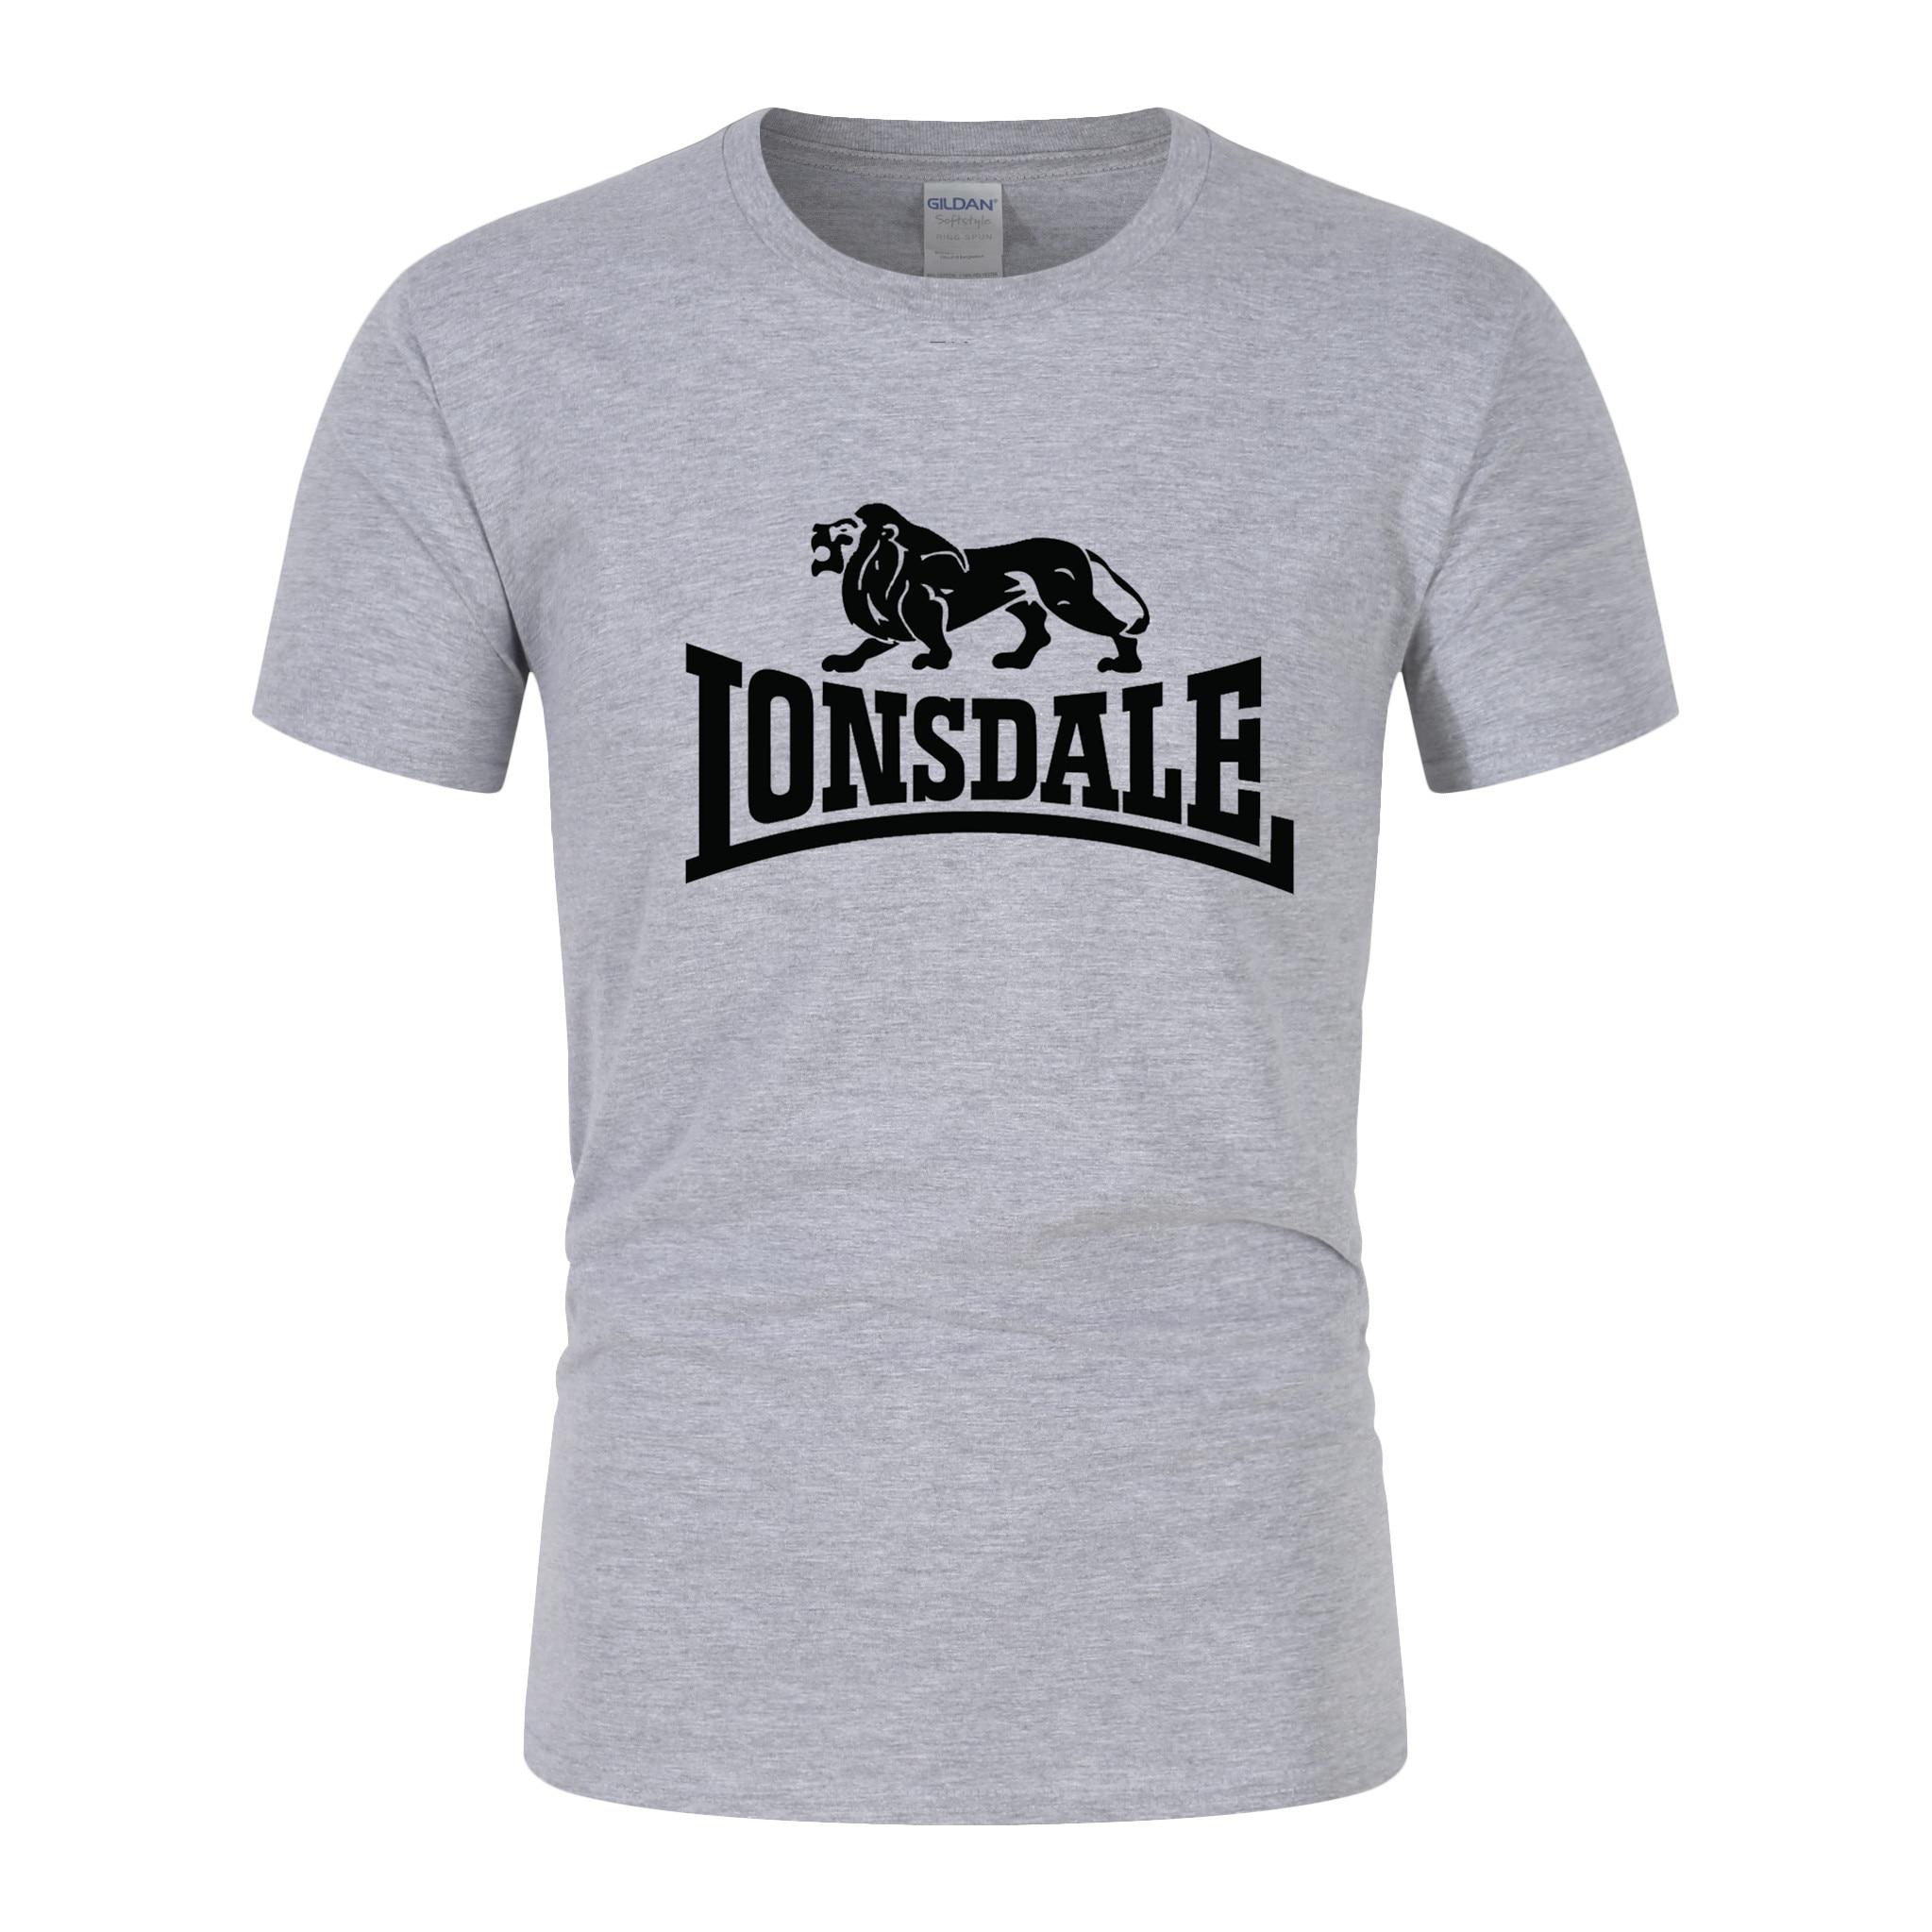 Camiseta de marca superior de verano para hombres Camiseta de algodón de manga corta Casual para correr ropa deportiva transpirable de Fitness